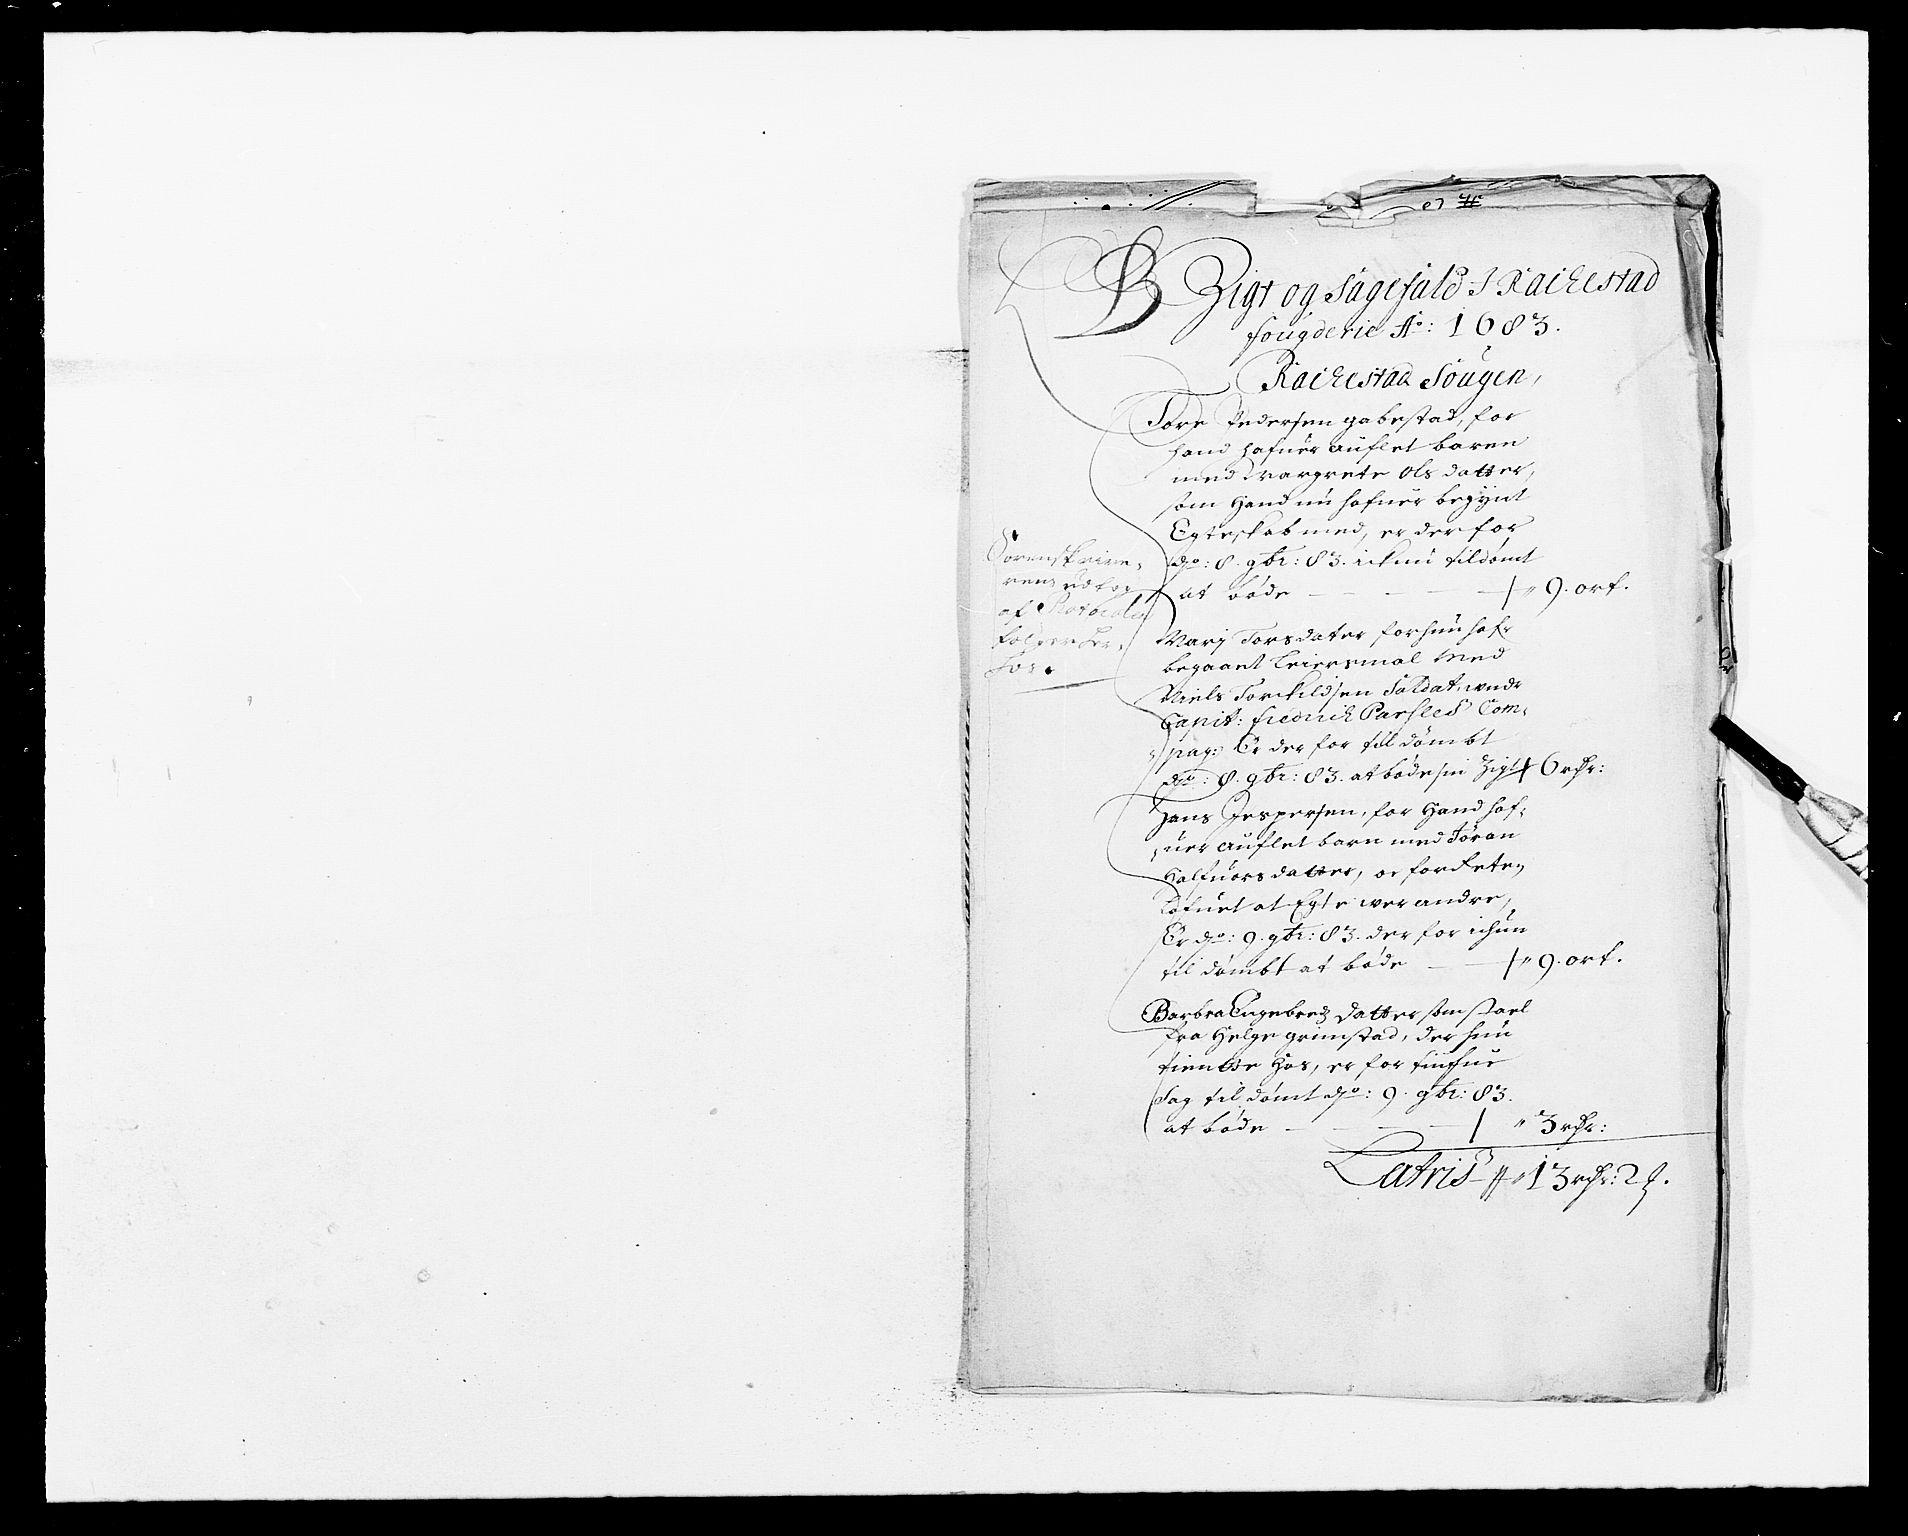 RA, Rentekammeret inntil 1814, Reviderte regnskaper, Fogderegnskap, R05/L0274: Fogderegnskap Rakkestad, 1683-1684, s. 37